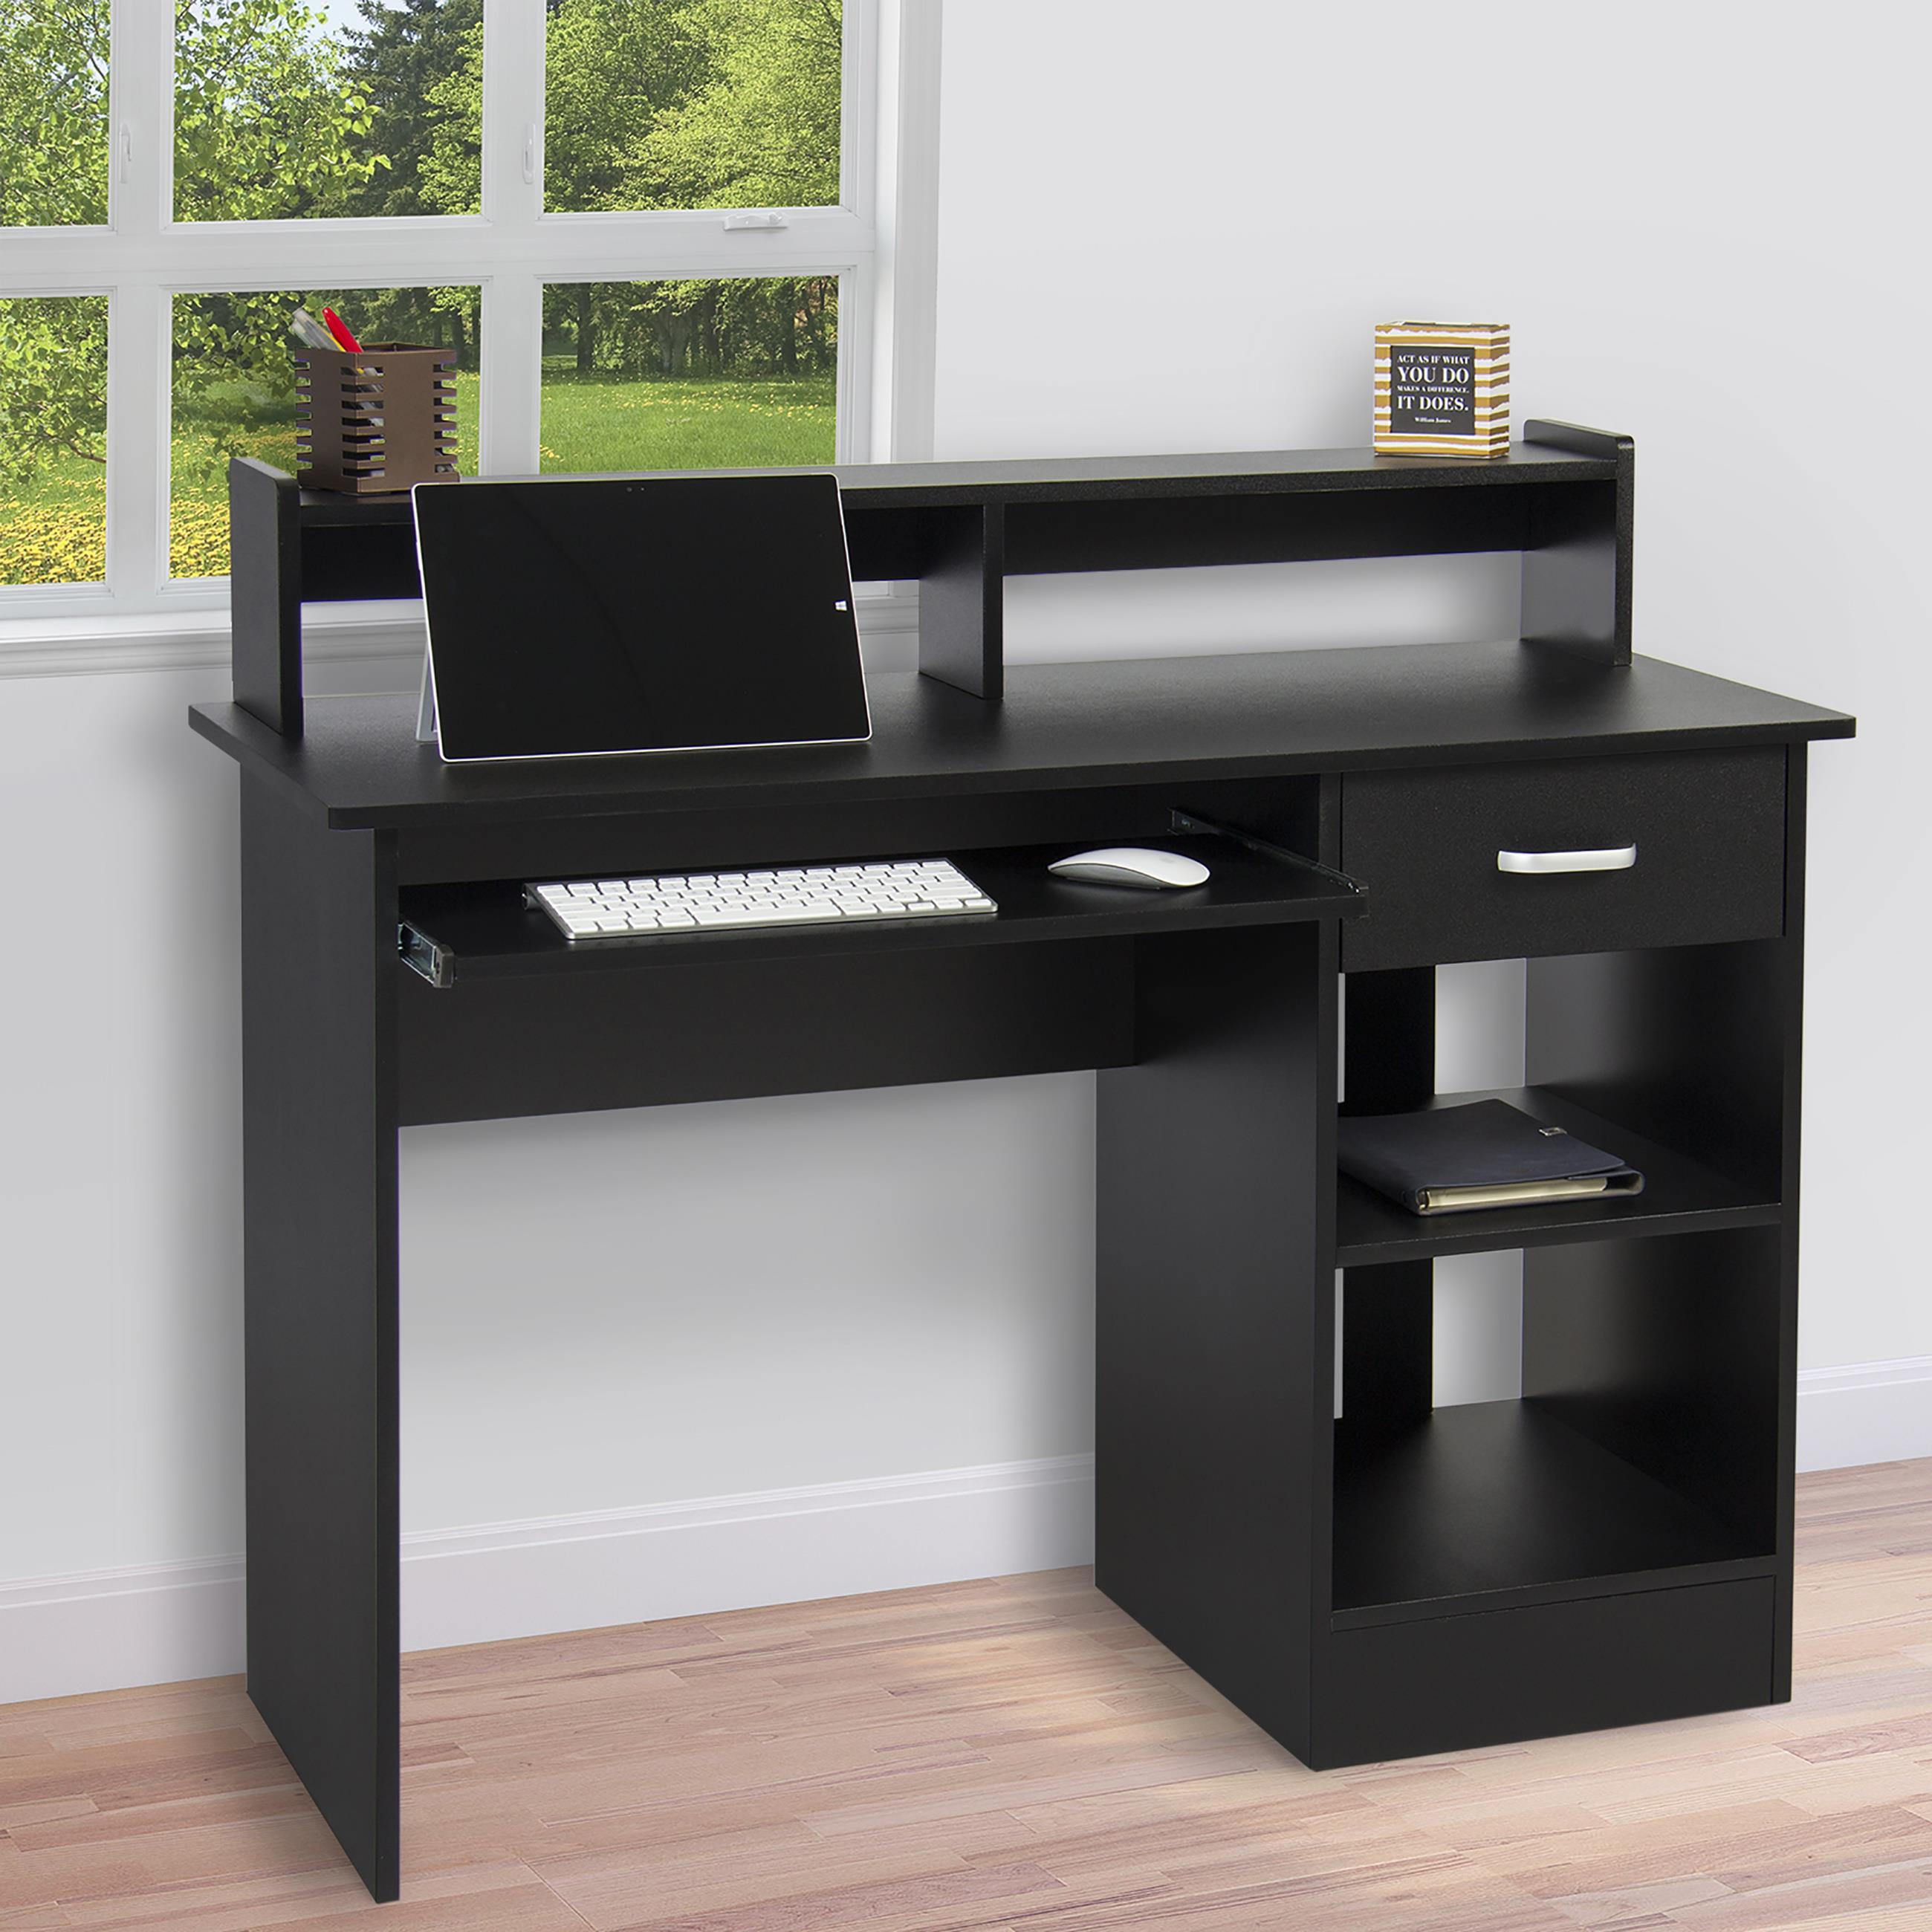 Black Computer Desk Home Office Workstation Laptop Table Drawer Keyboard Tray Ebay